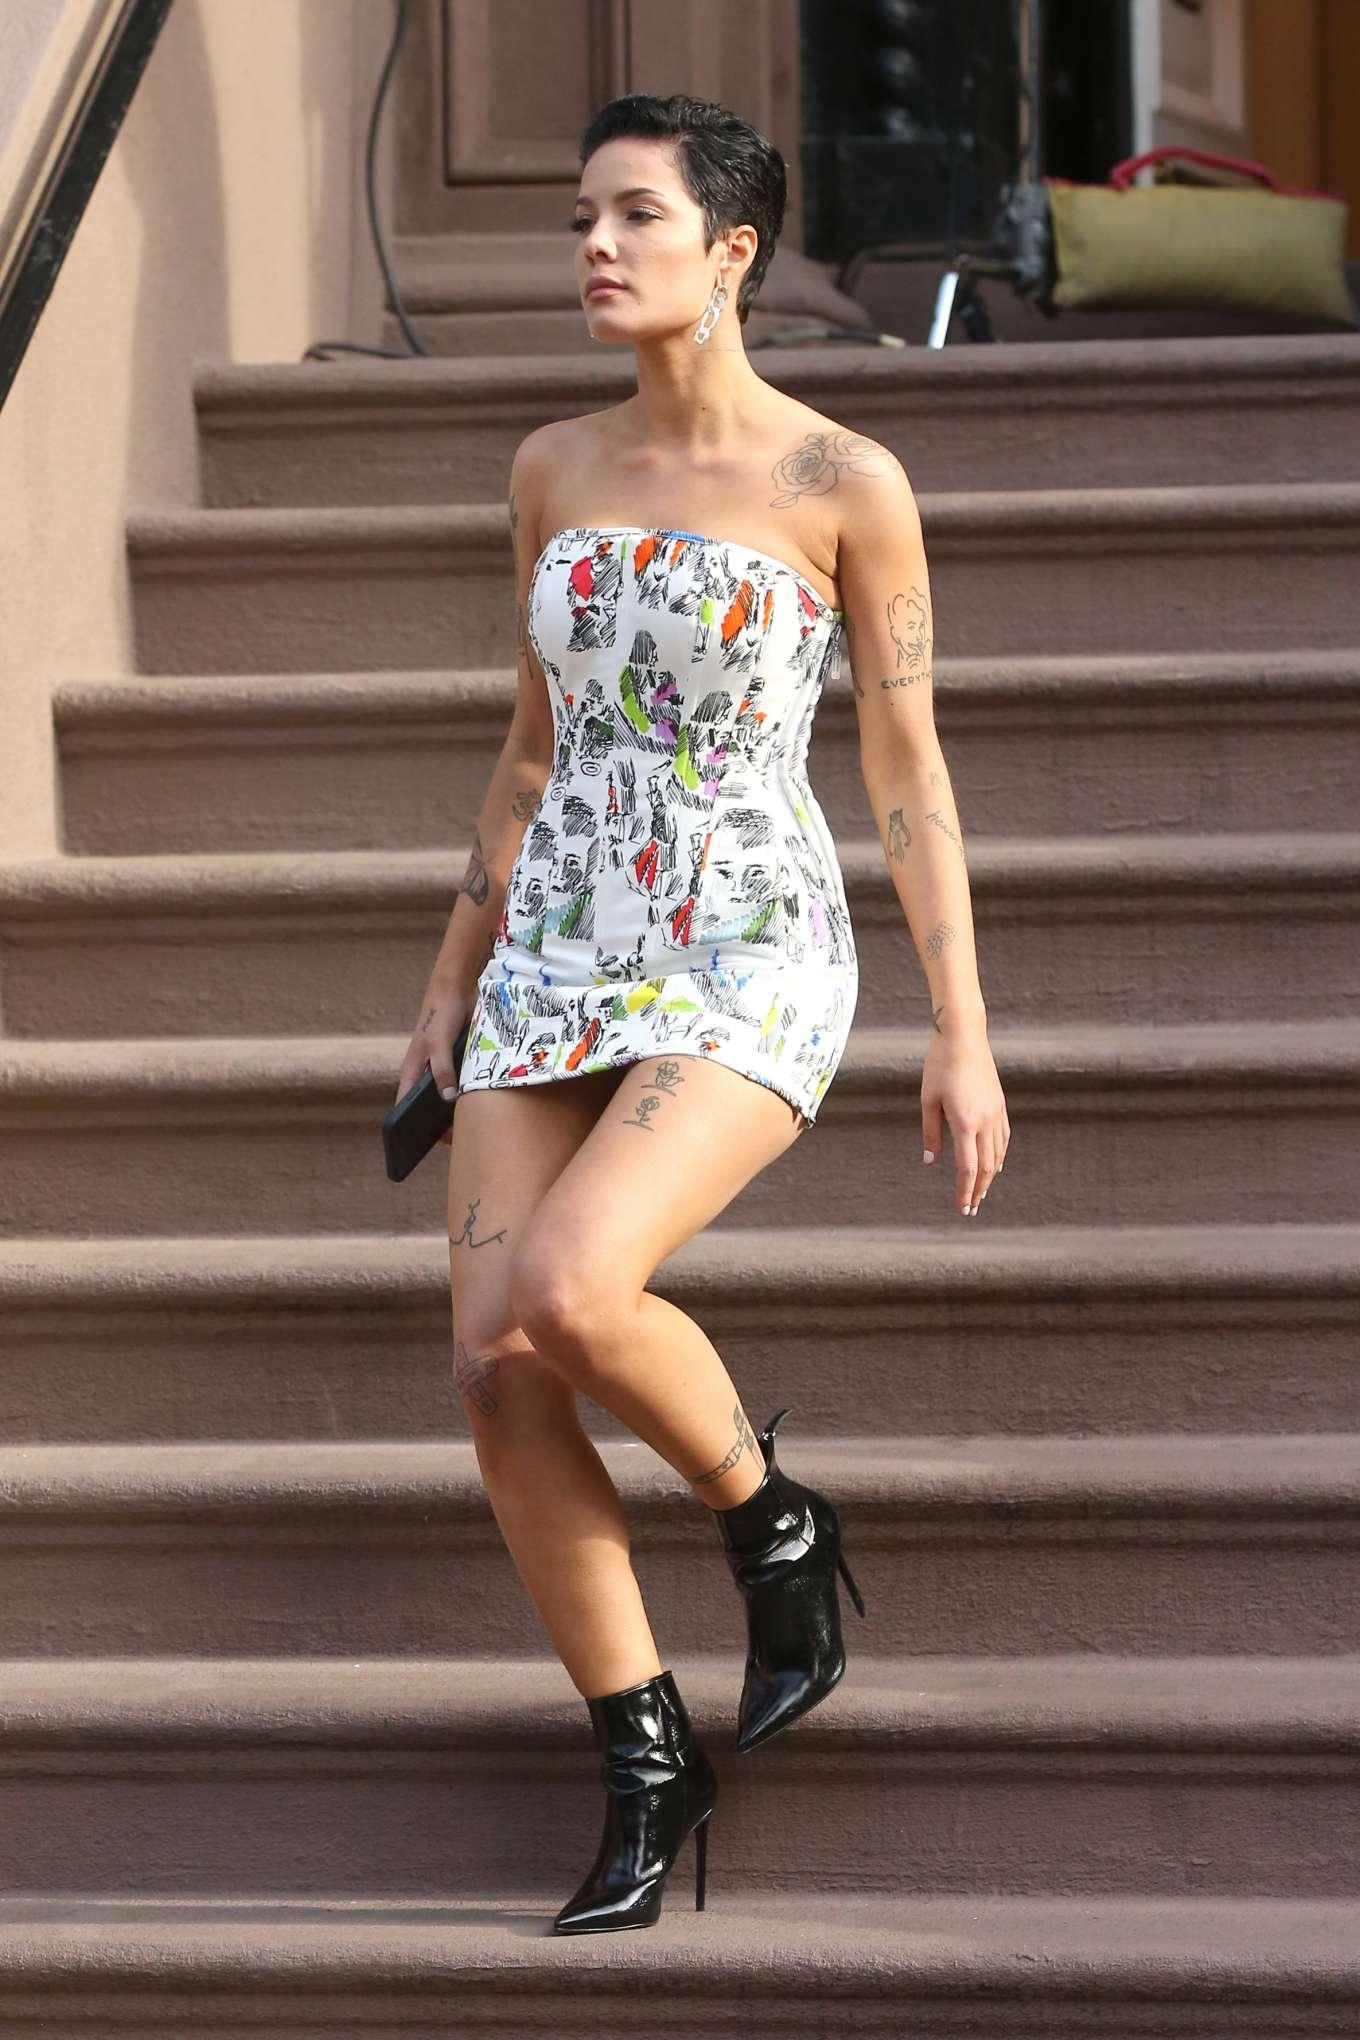 Halsey 2020 : Halsey in Mini Dress at Salmagundi Club in New York City-22